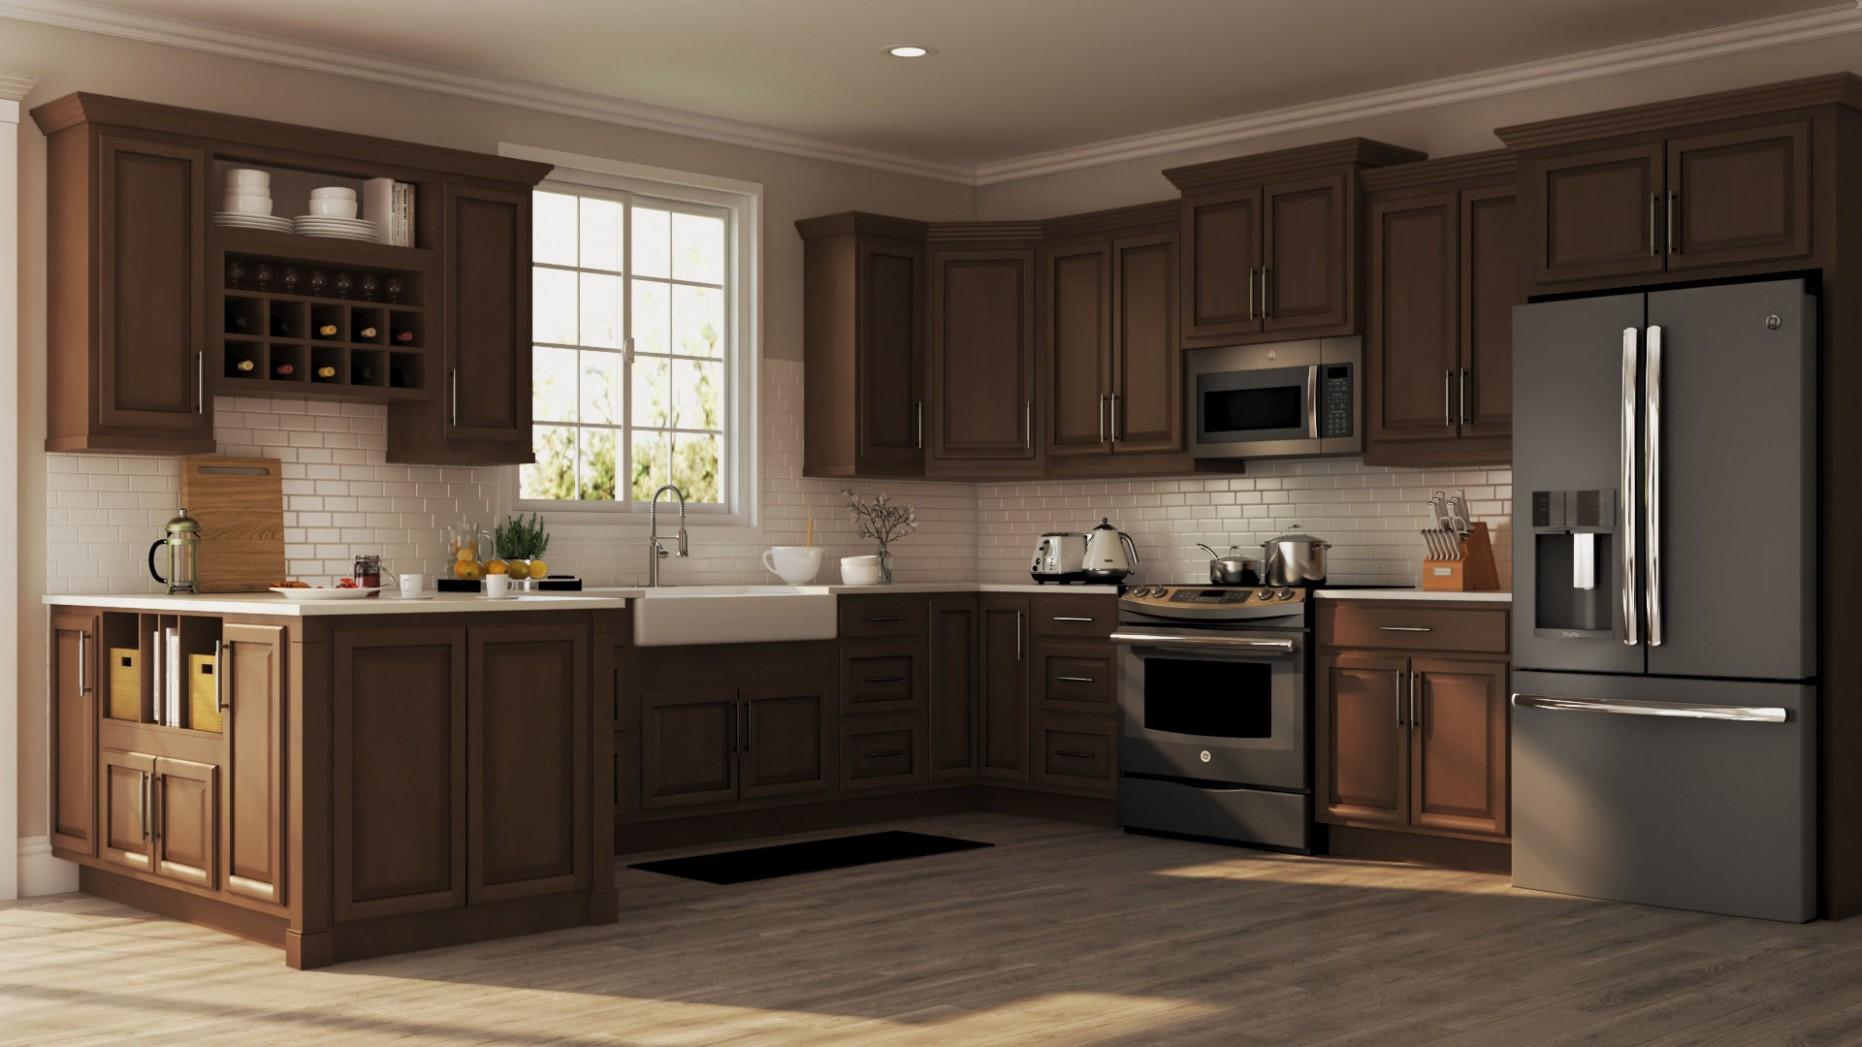 Hampton Base Kitchen Cabinets in Cognac – Kitchen – The Home Depot - Long Base Kitchen Cabinets